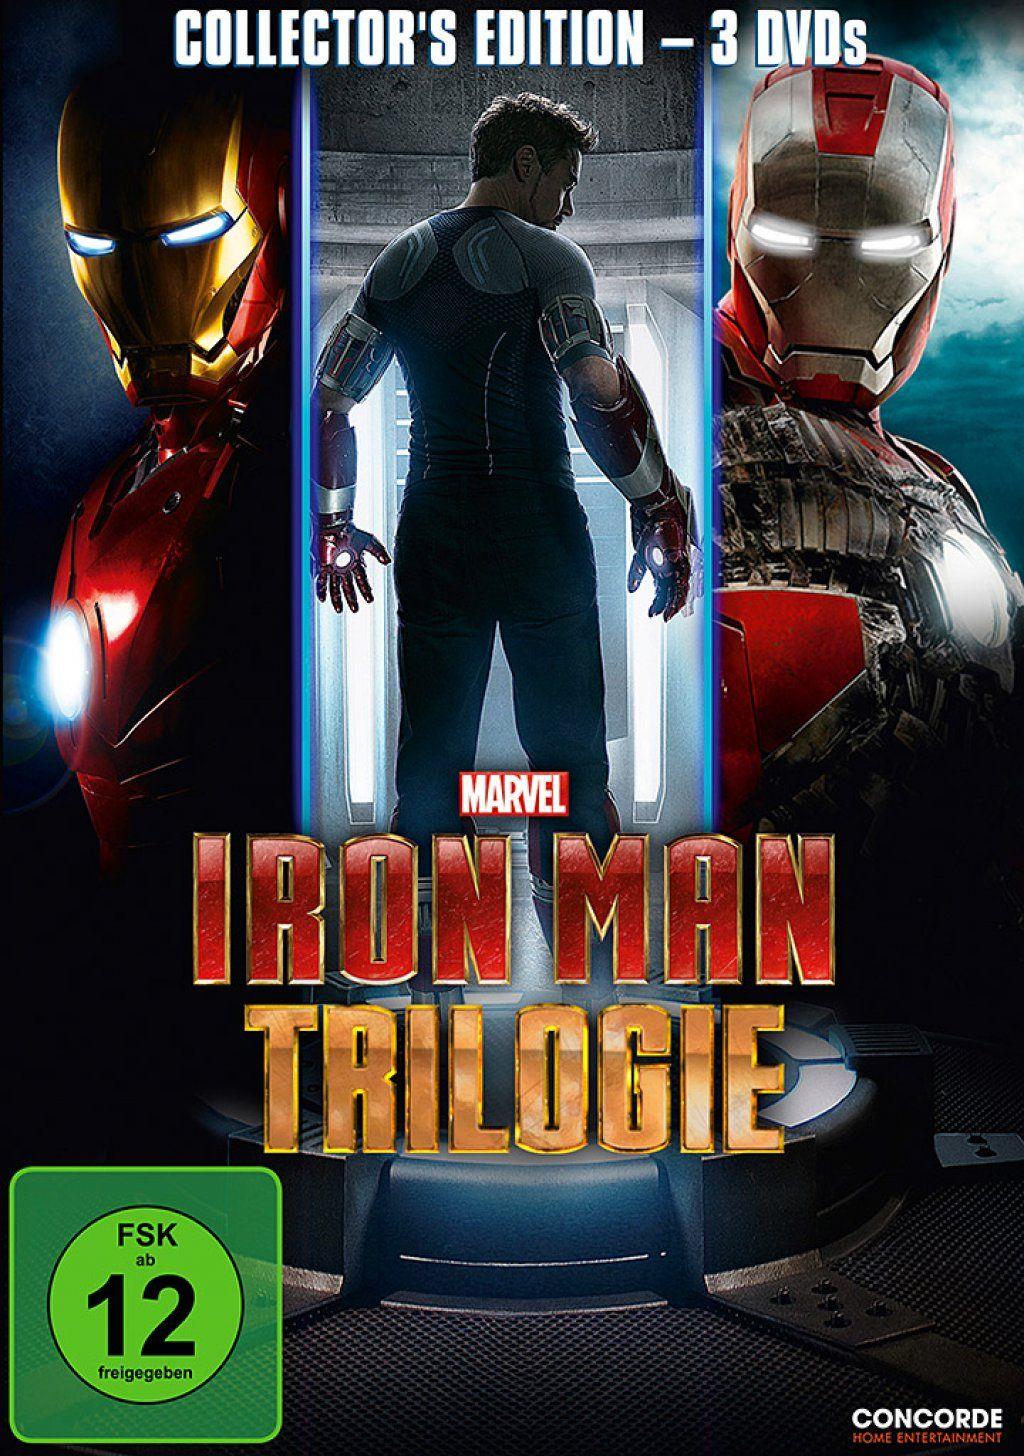 Iron Man Trilogie (3 Discs)